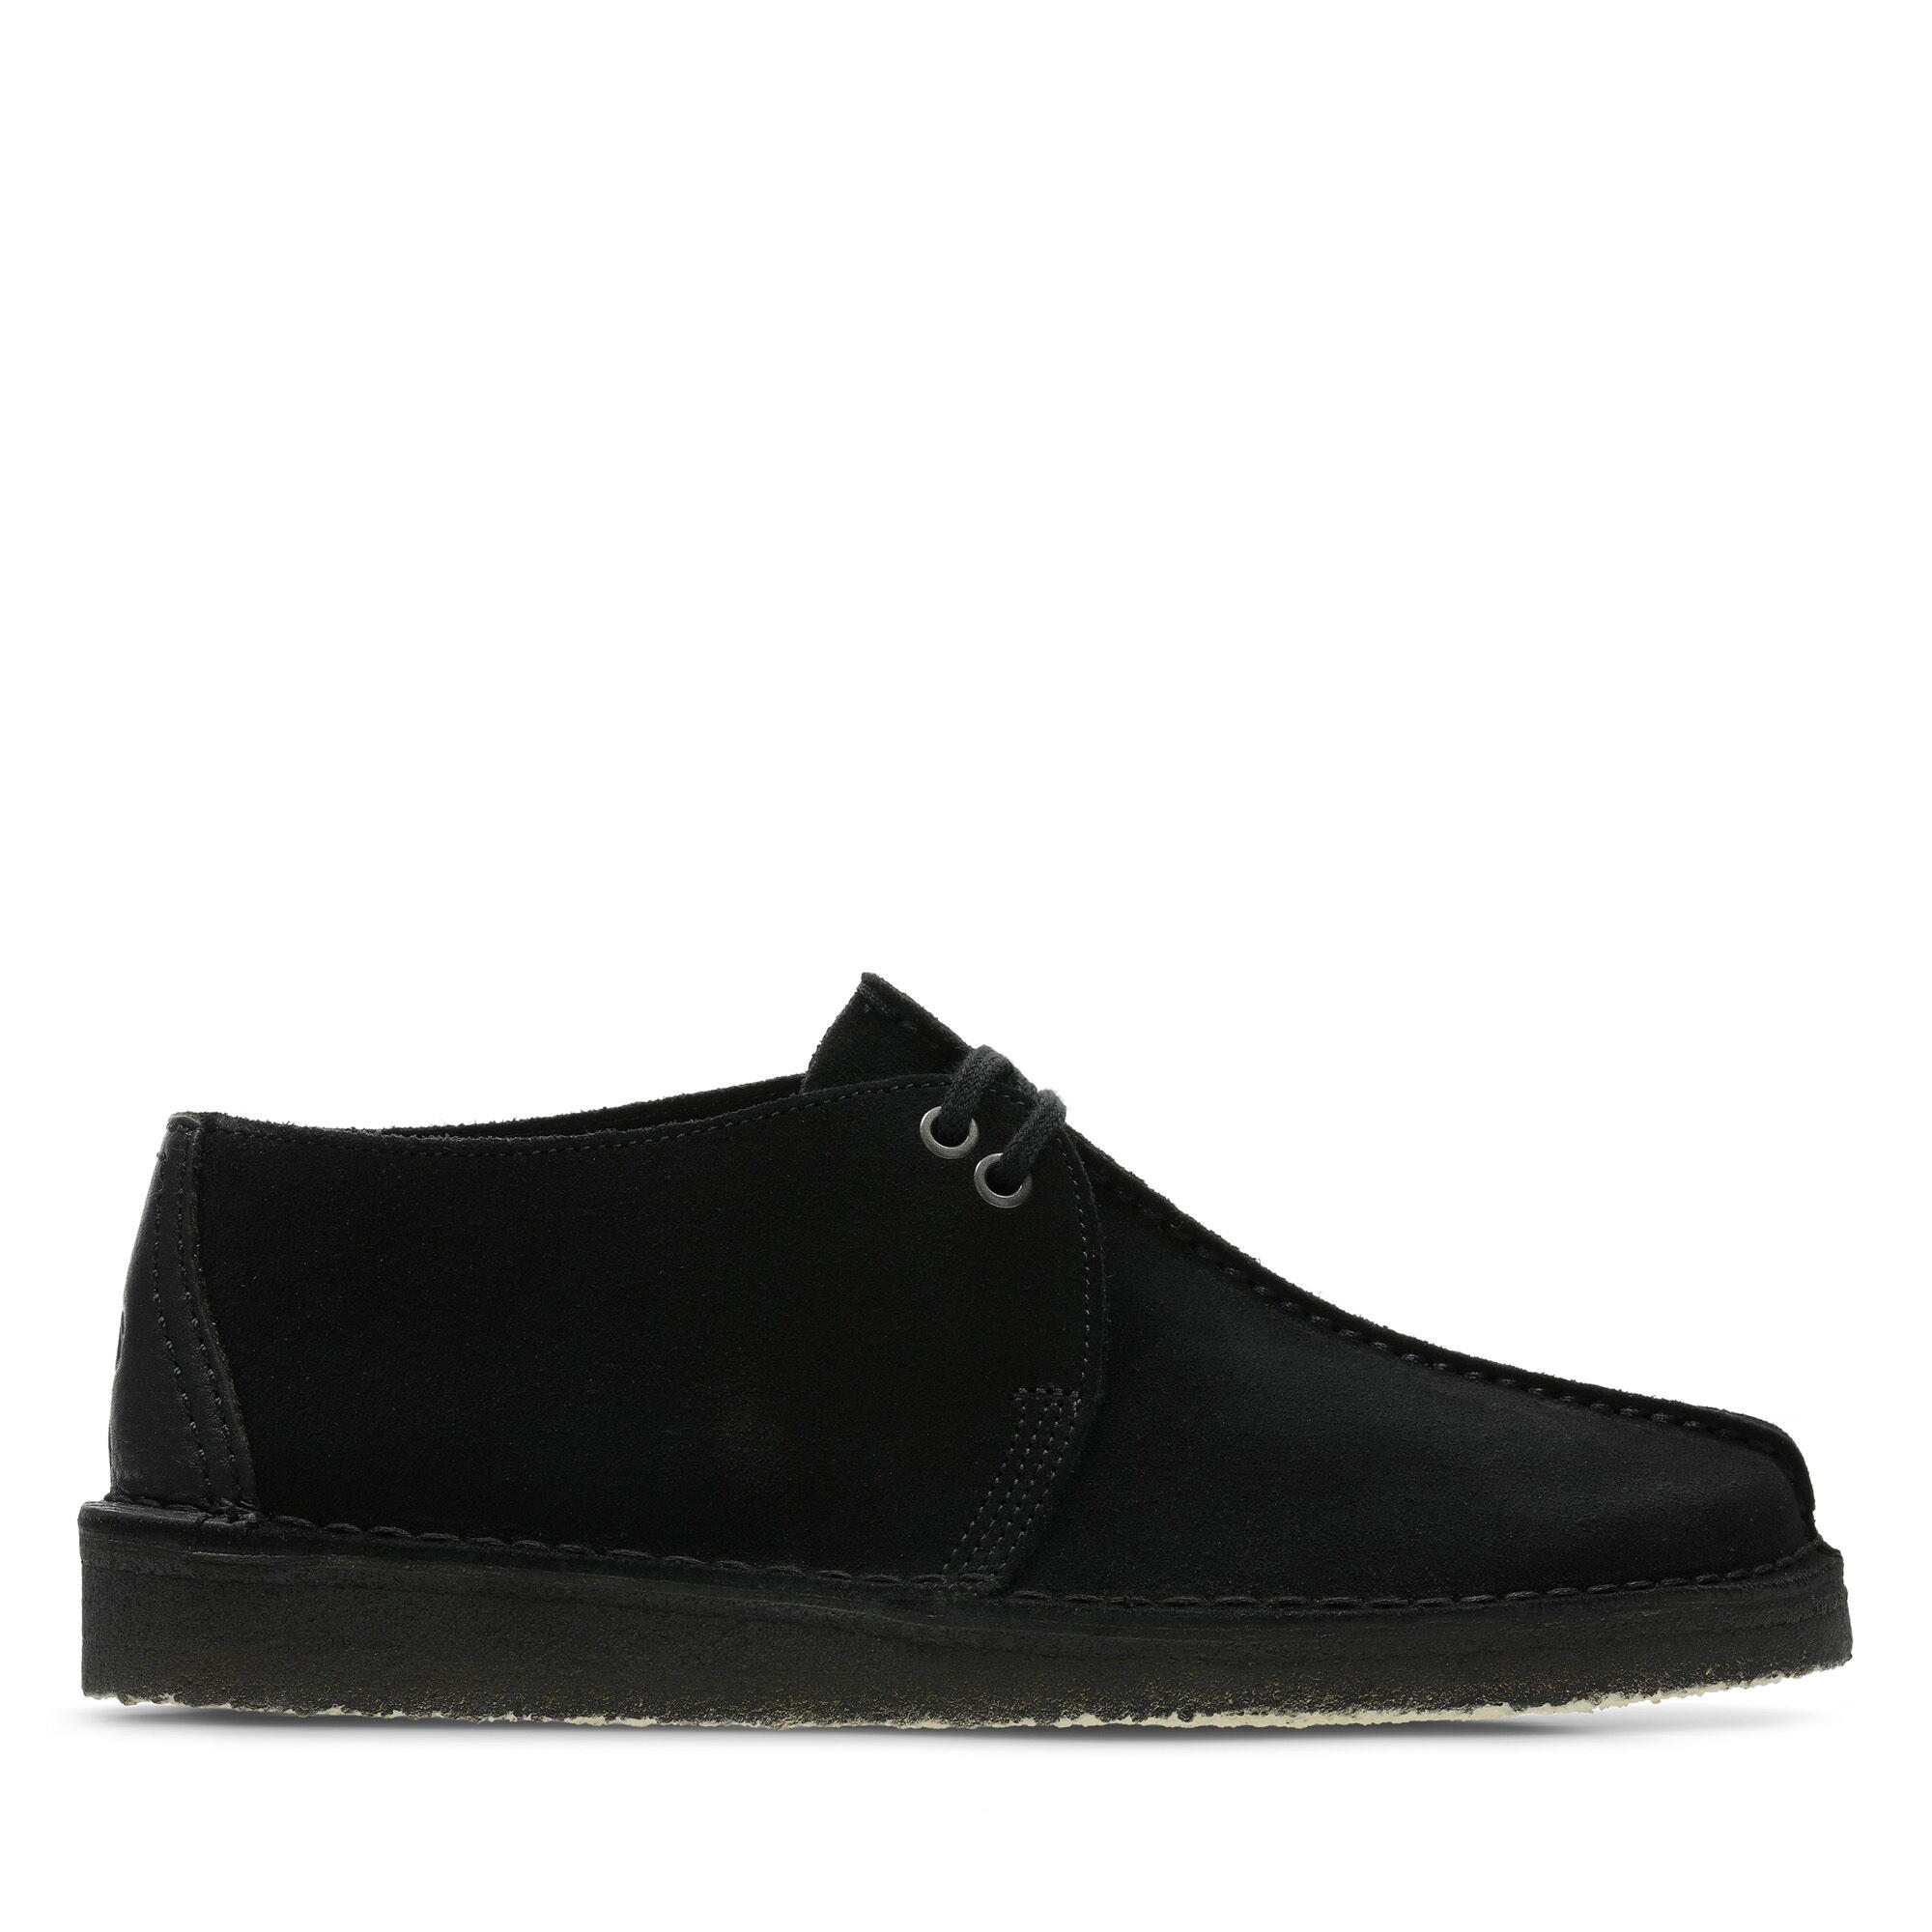 Black Suede Shoes - Desert Trek | Clarks